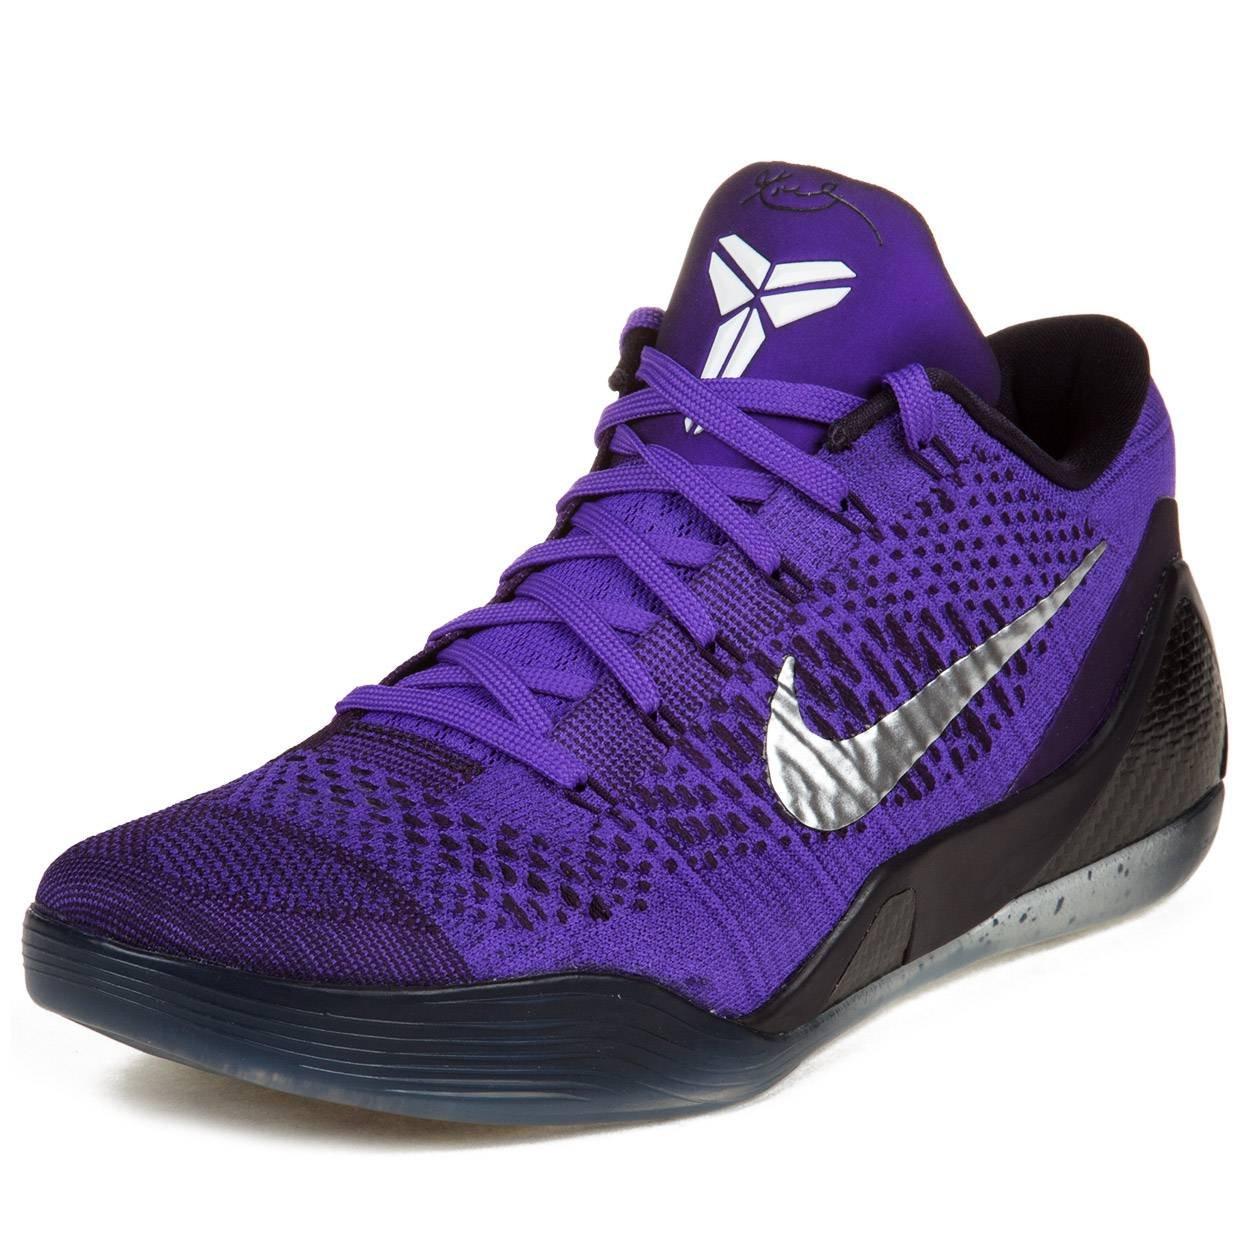 save off b2542 4ba02 Galleon - Nike Mens Kobe IX Elite Low Moonwalker Hyper Grape White-Cave  Purple Woven Basketball Shoes Size 10